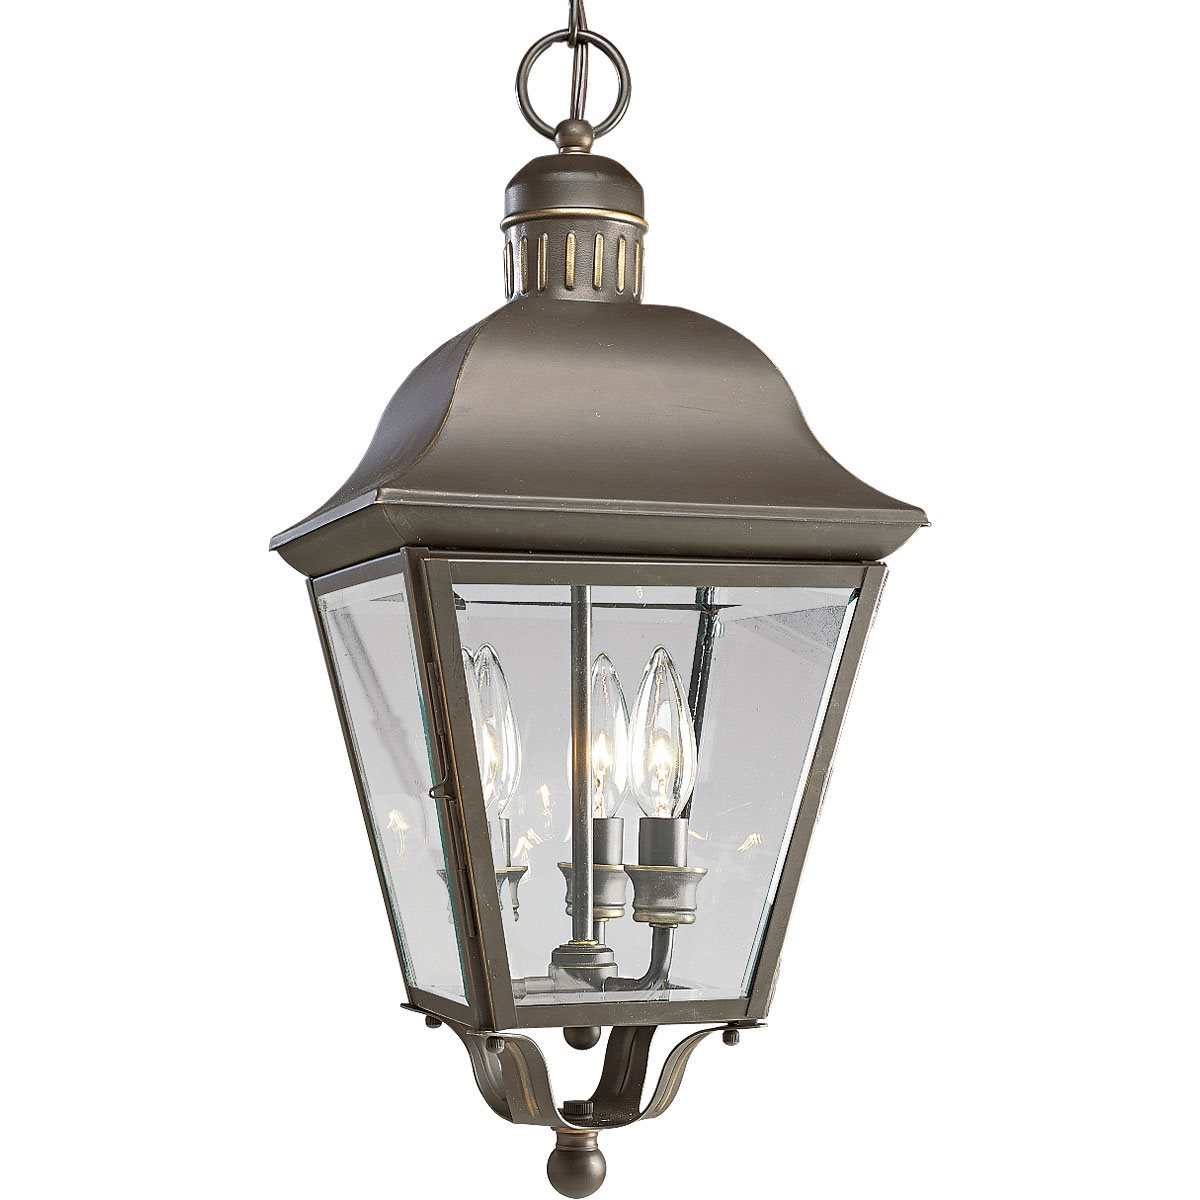 Traditional Outdoor Pendant Lighting : Progress lighting p andover traditional outdoor